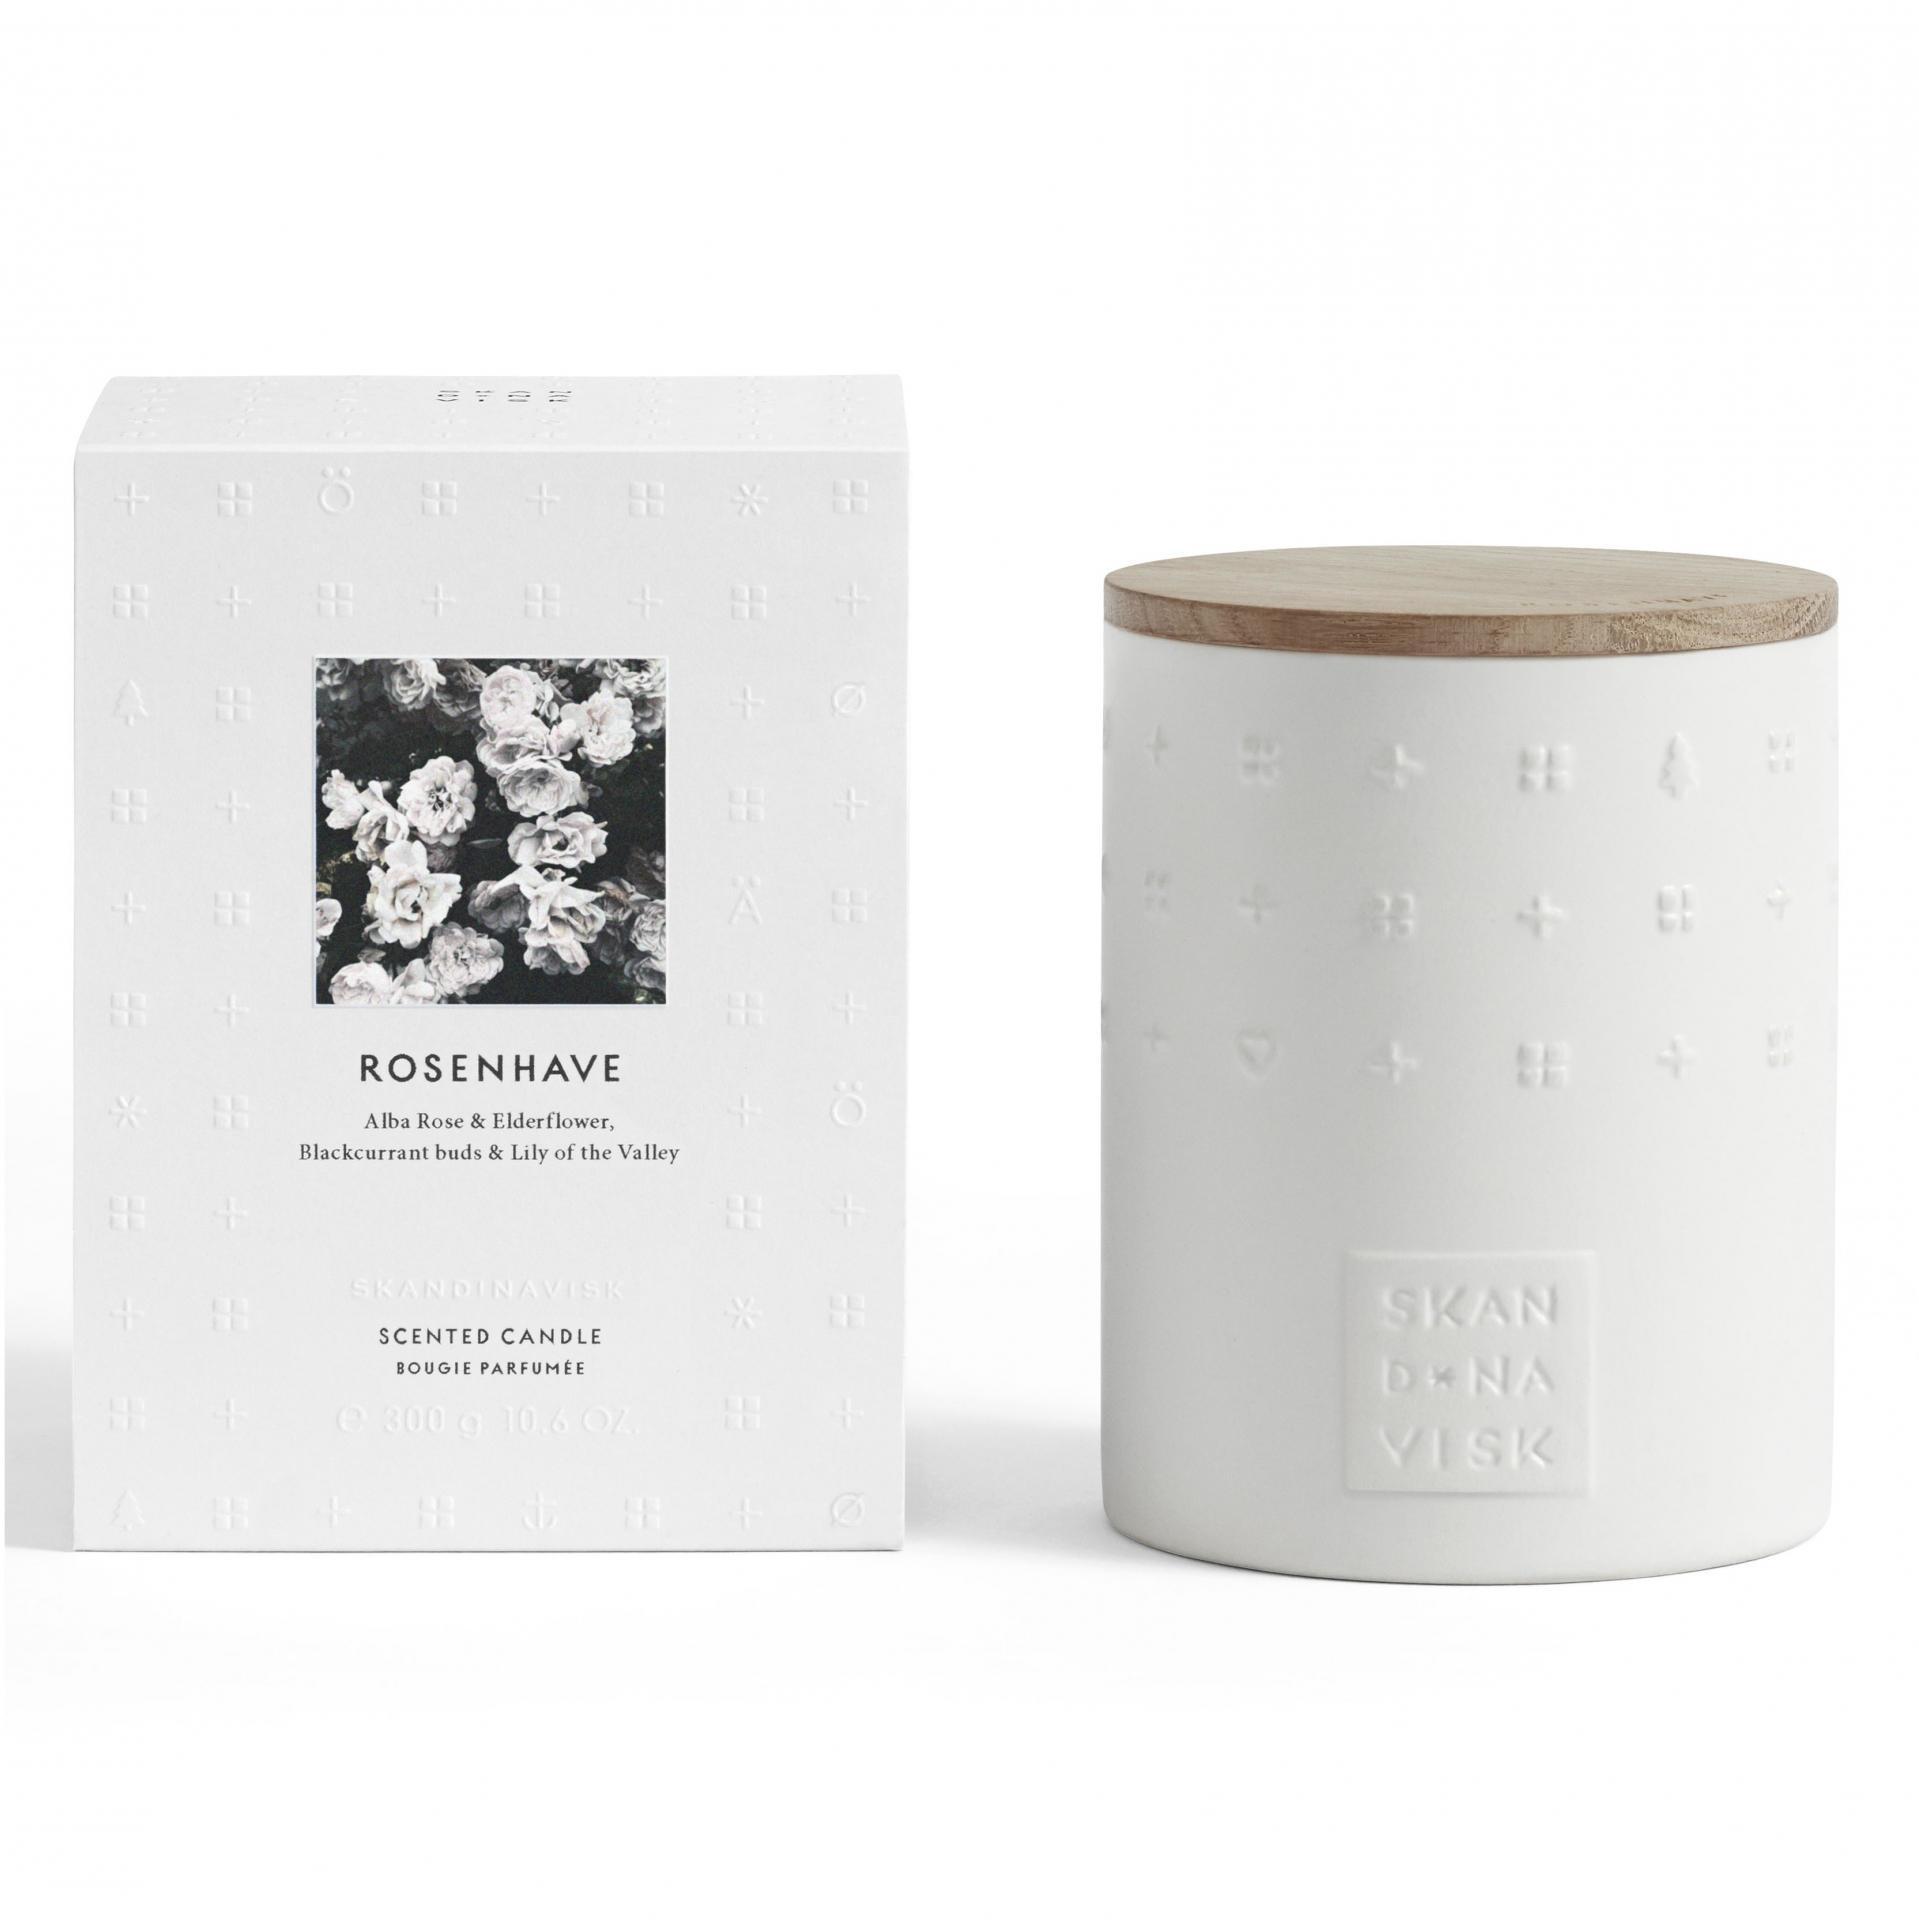 SKANDINAVISK Vonná svíčka ROSENHAVE (růžová zahrada) 300 g, bílá barva, keramika